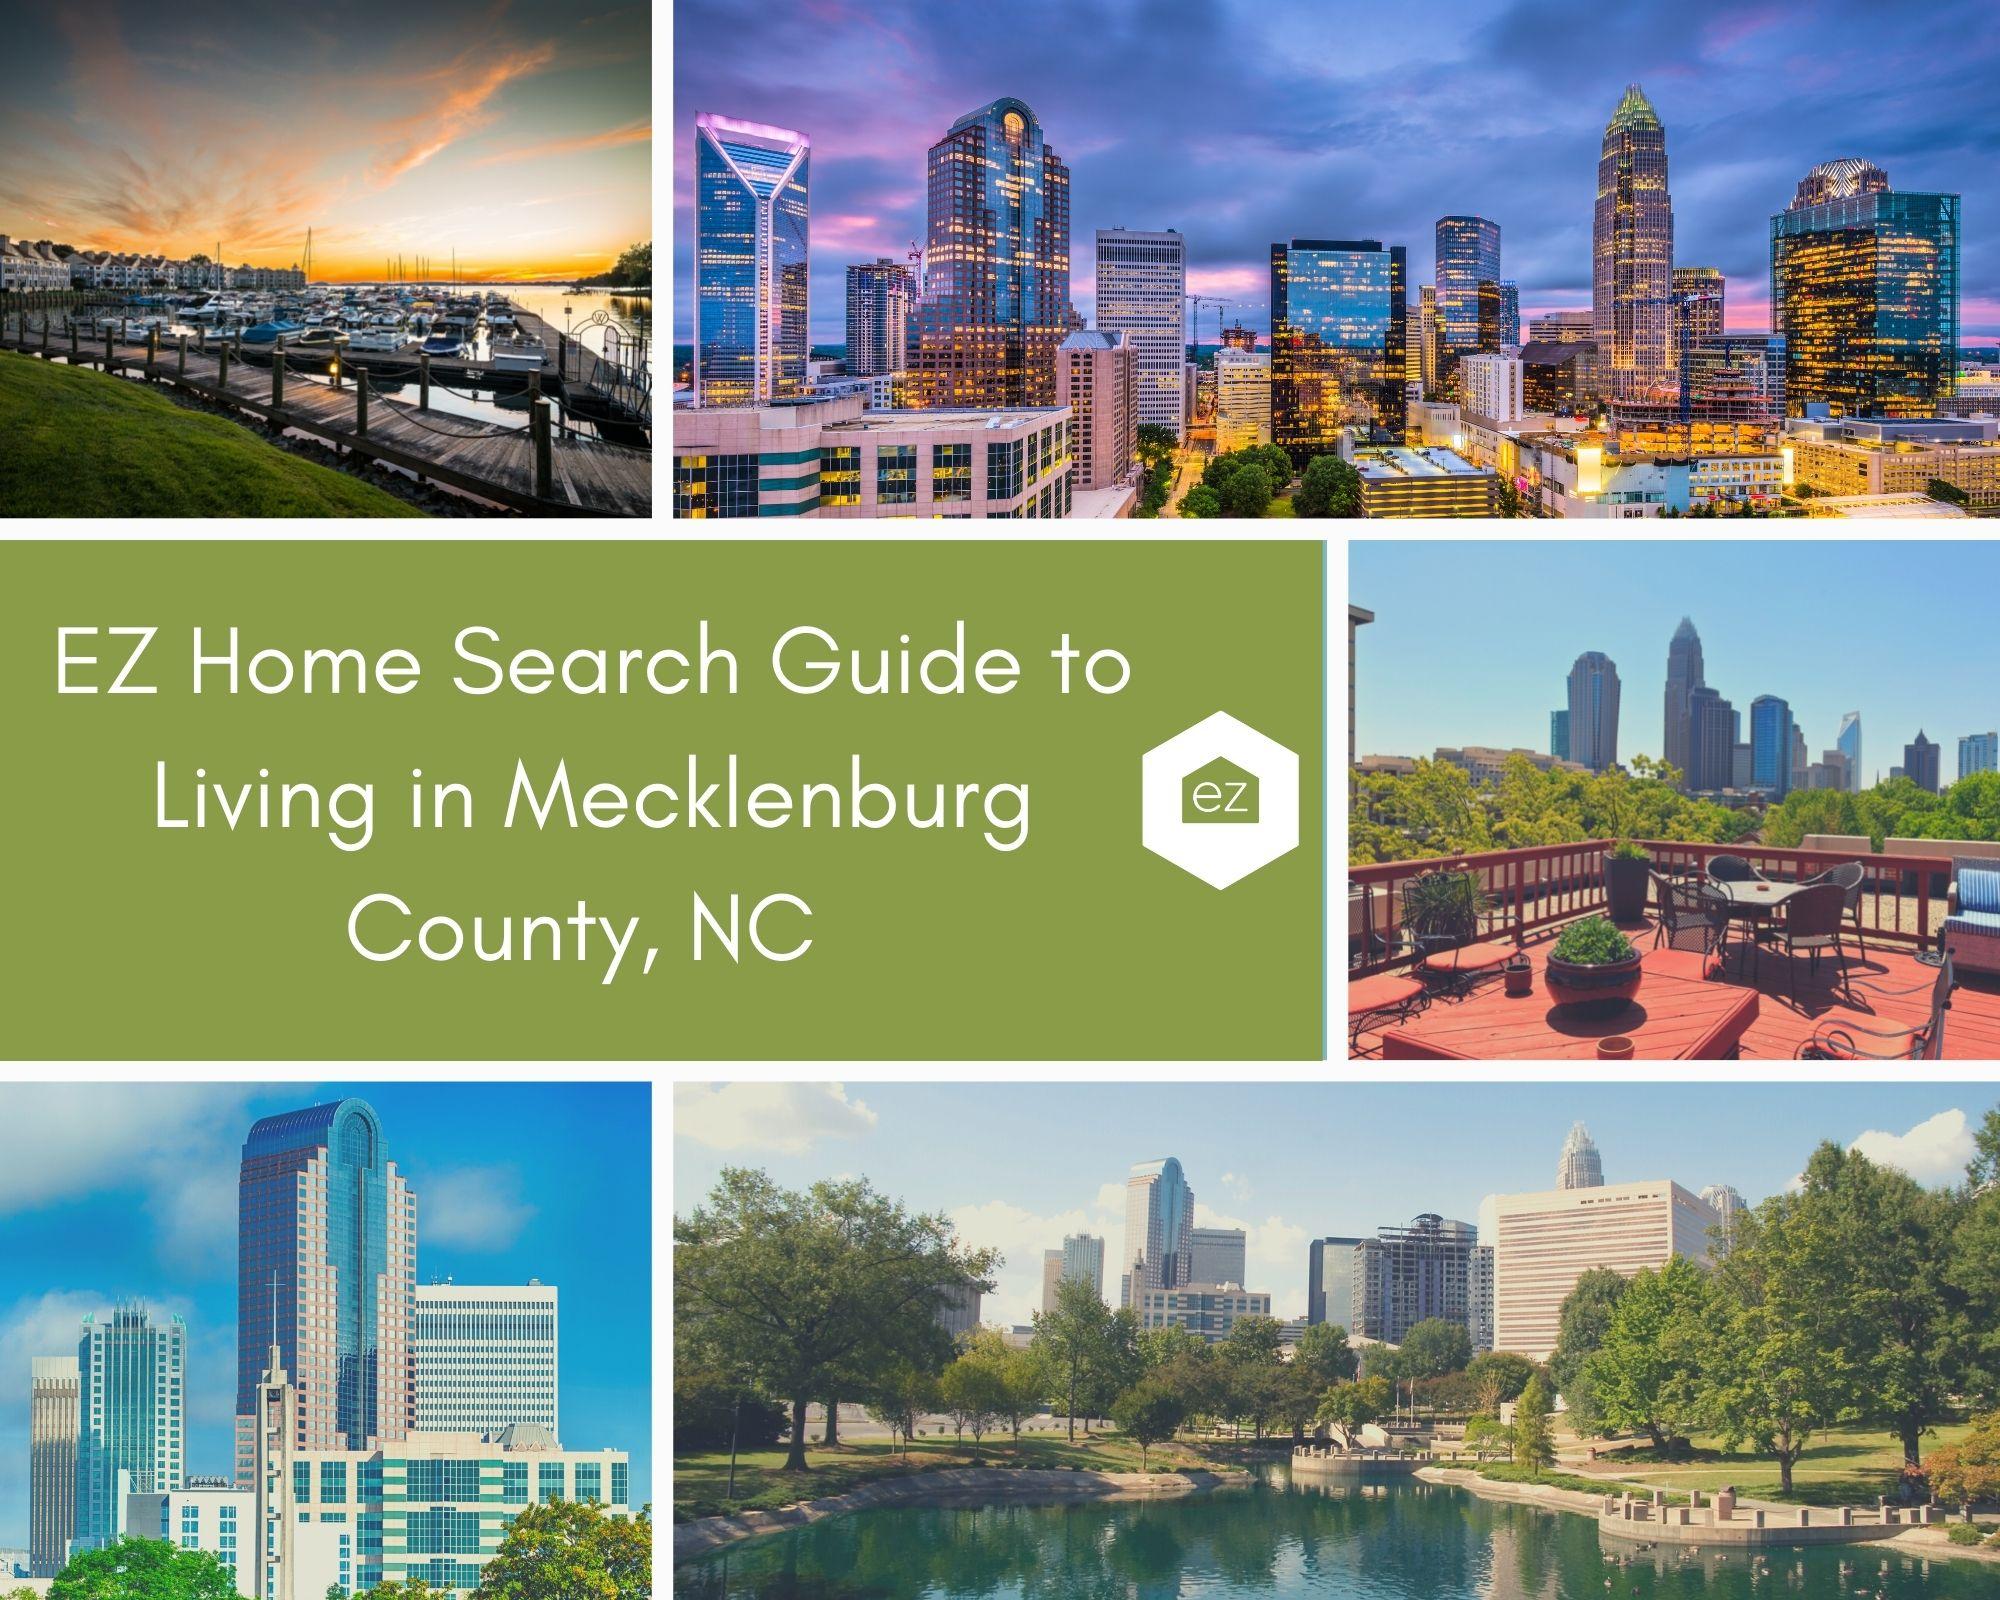 Photos of Charlotte North Carolina, downtown Charlotte skyline